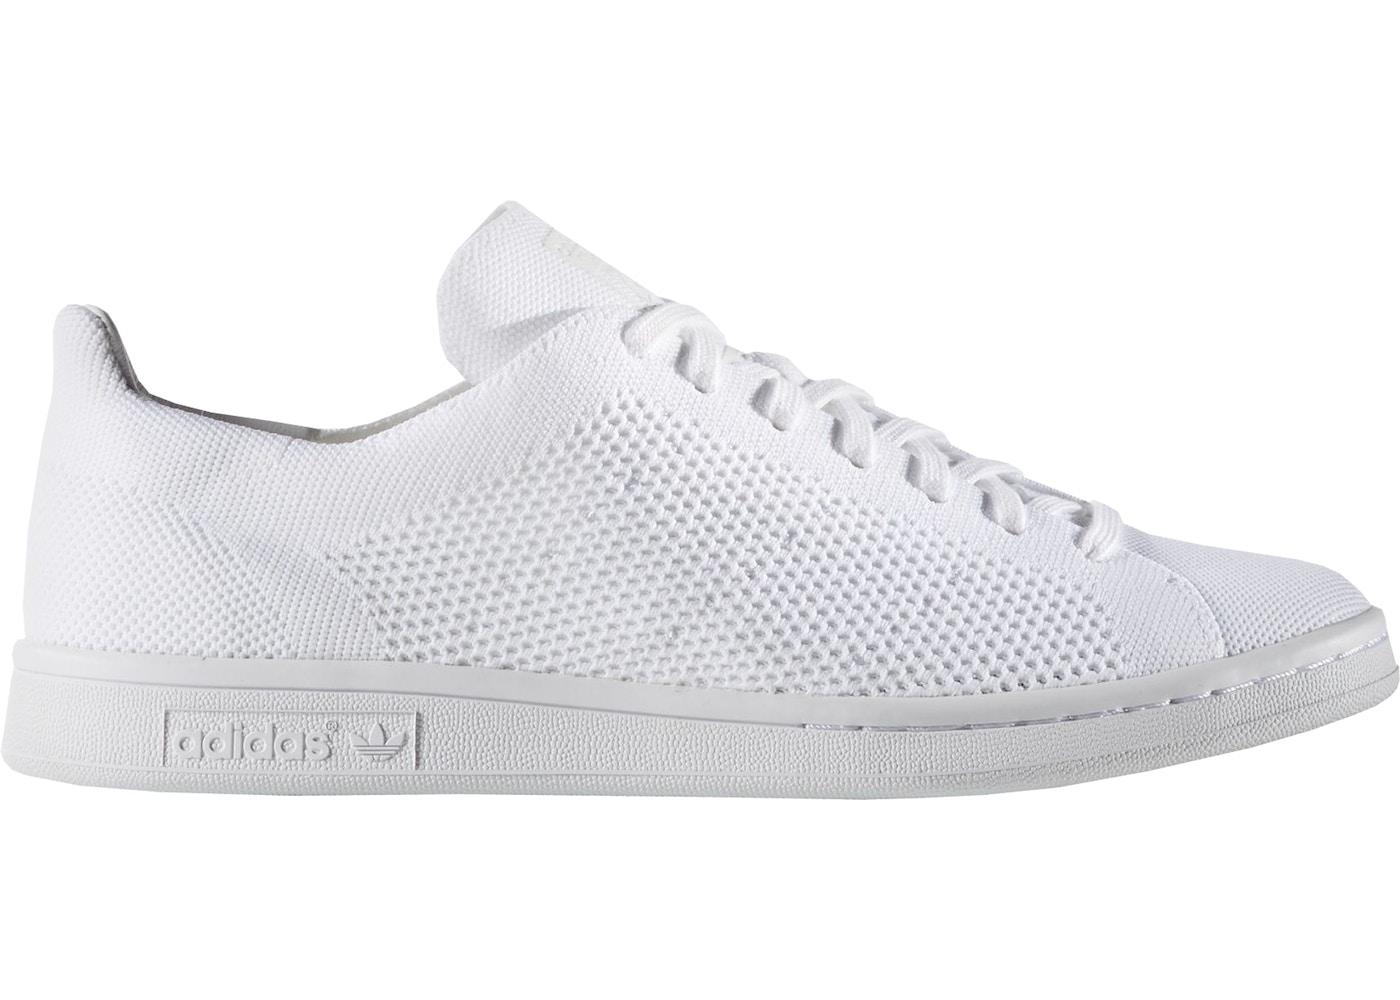 adidas Stan Smith Primeknit Triple White - BB3786